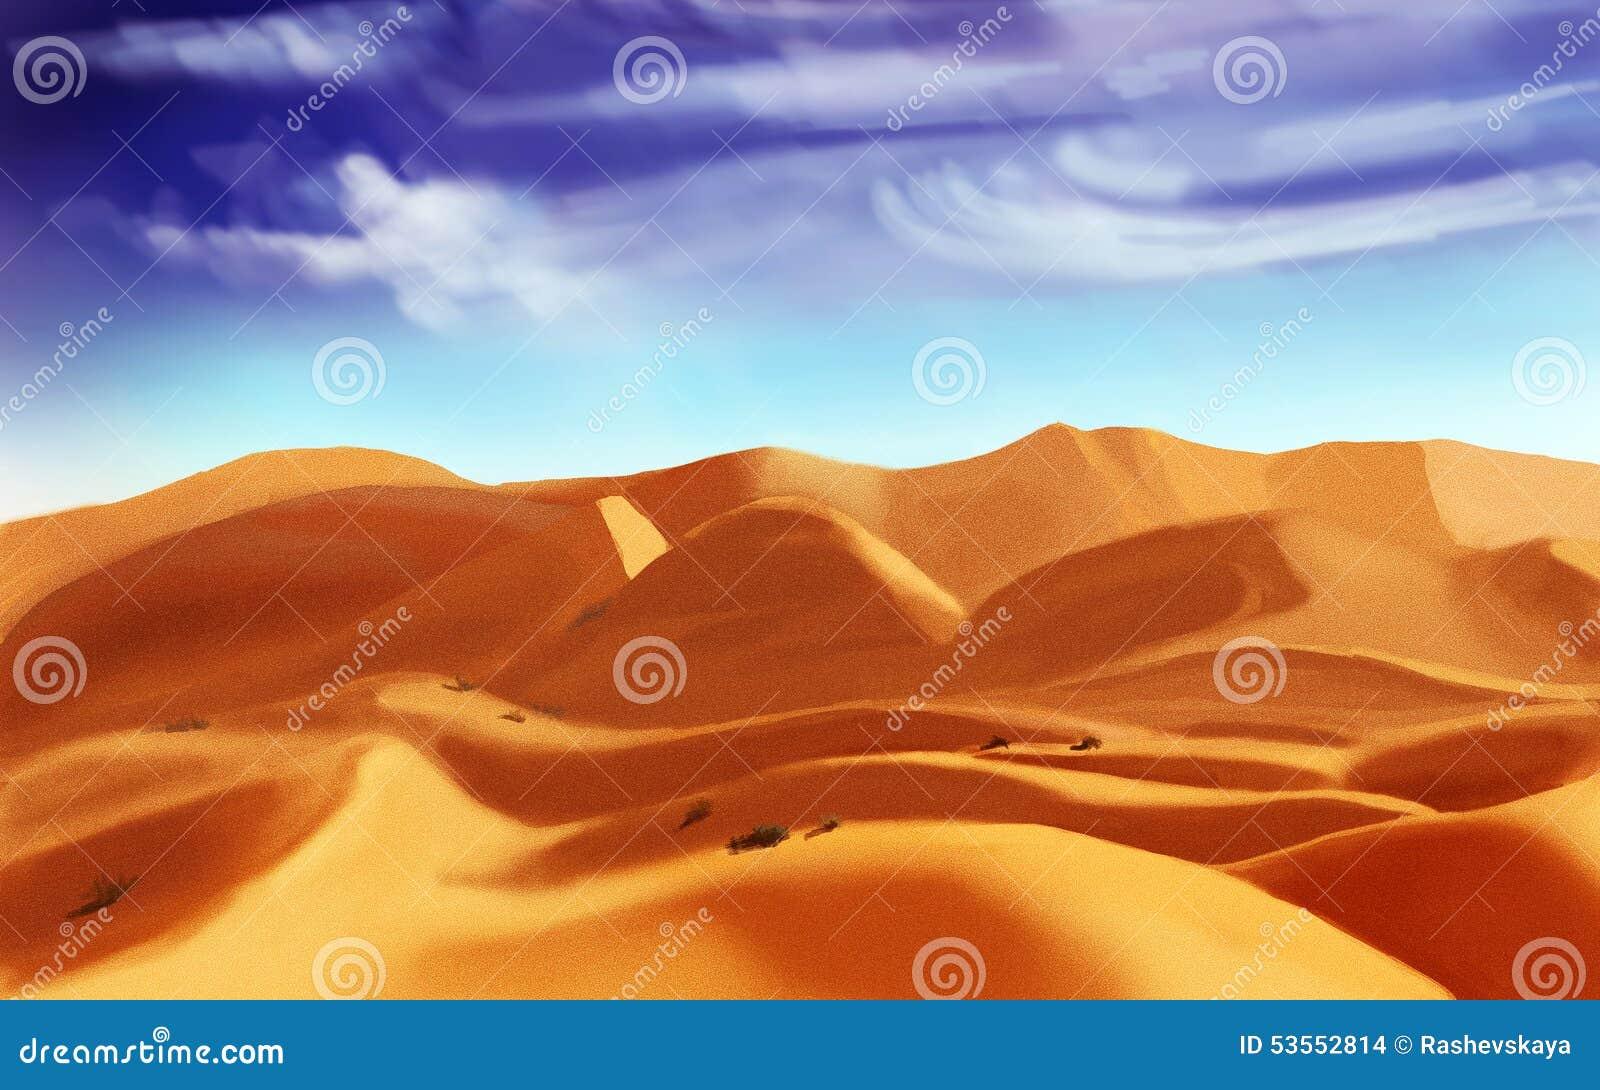 Desert sand, digital drawing